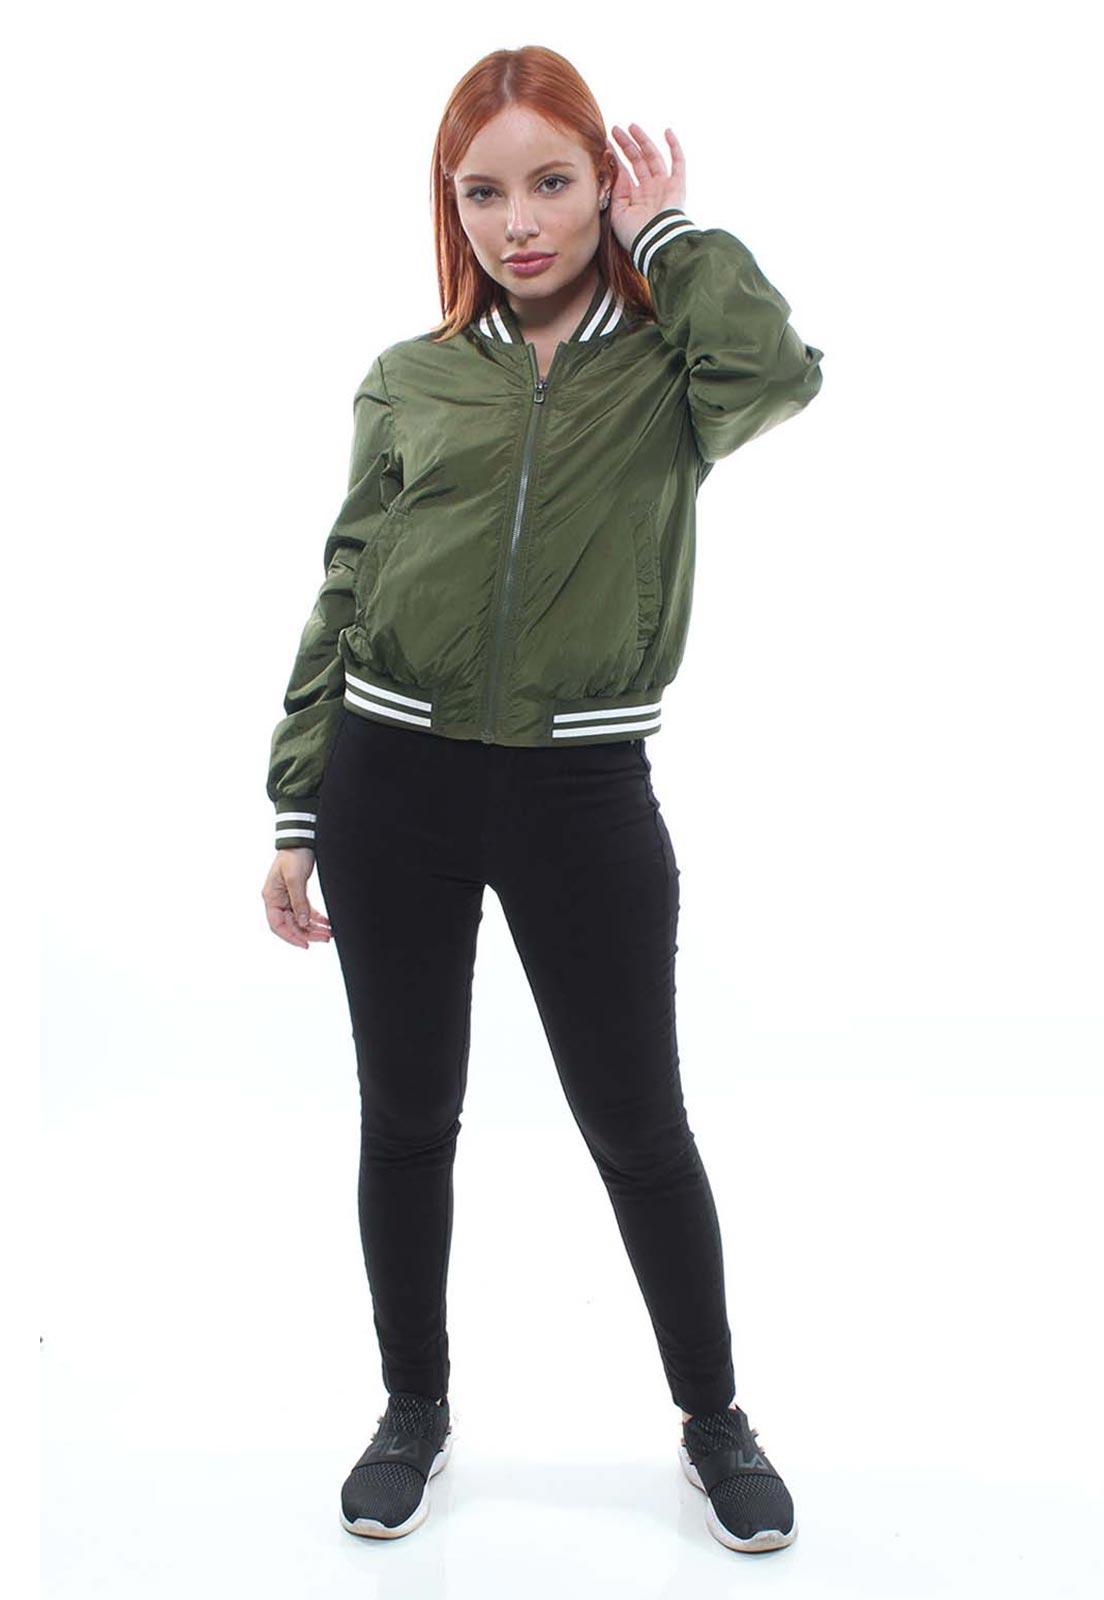 Jaqueta Feminina Poliester Crocker - 47448  - CROCKER JEANS